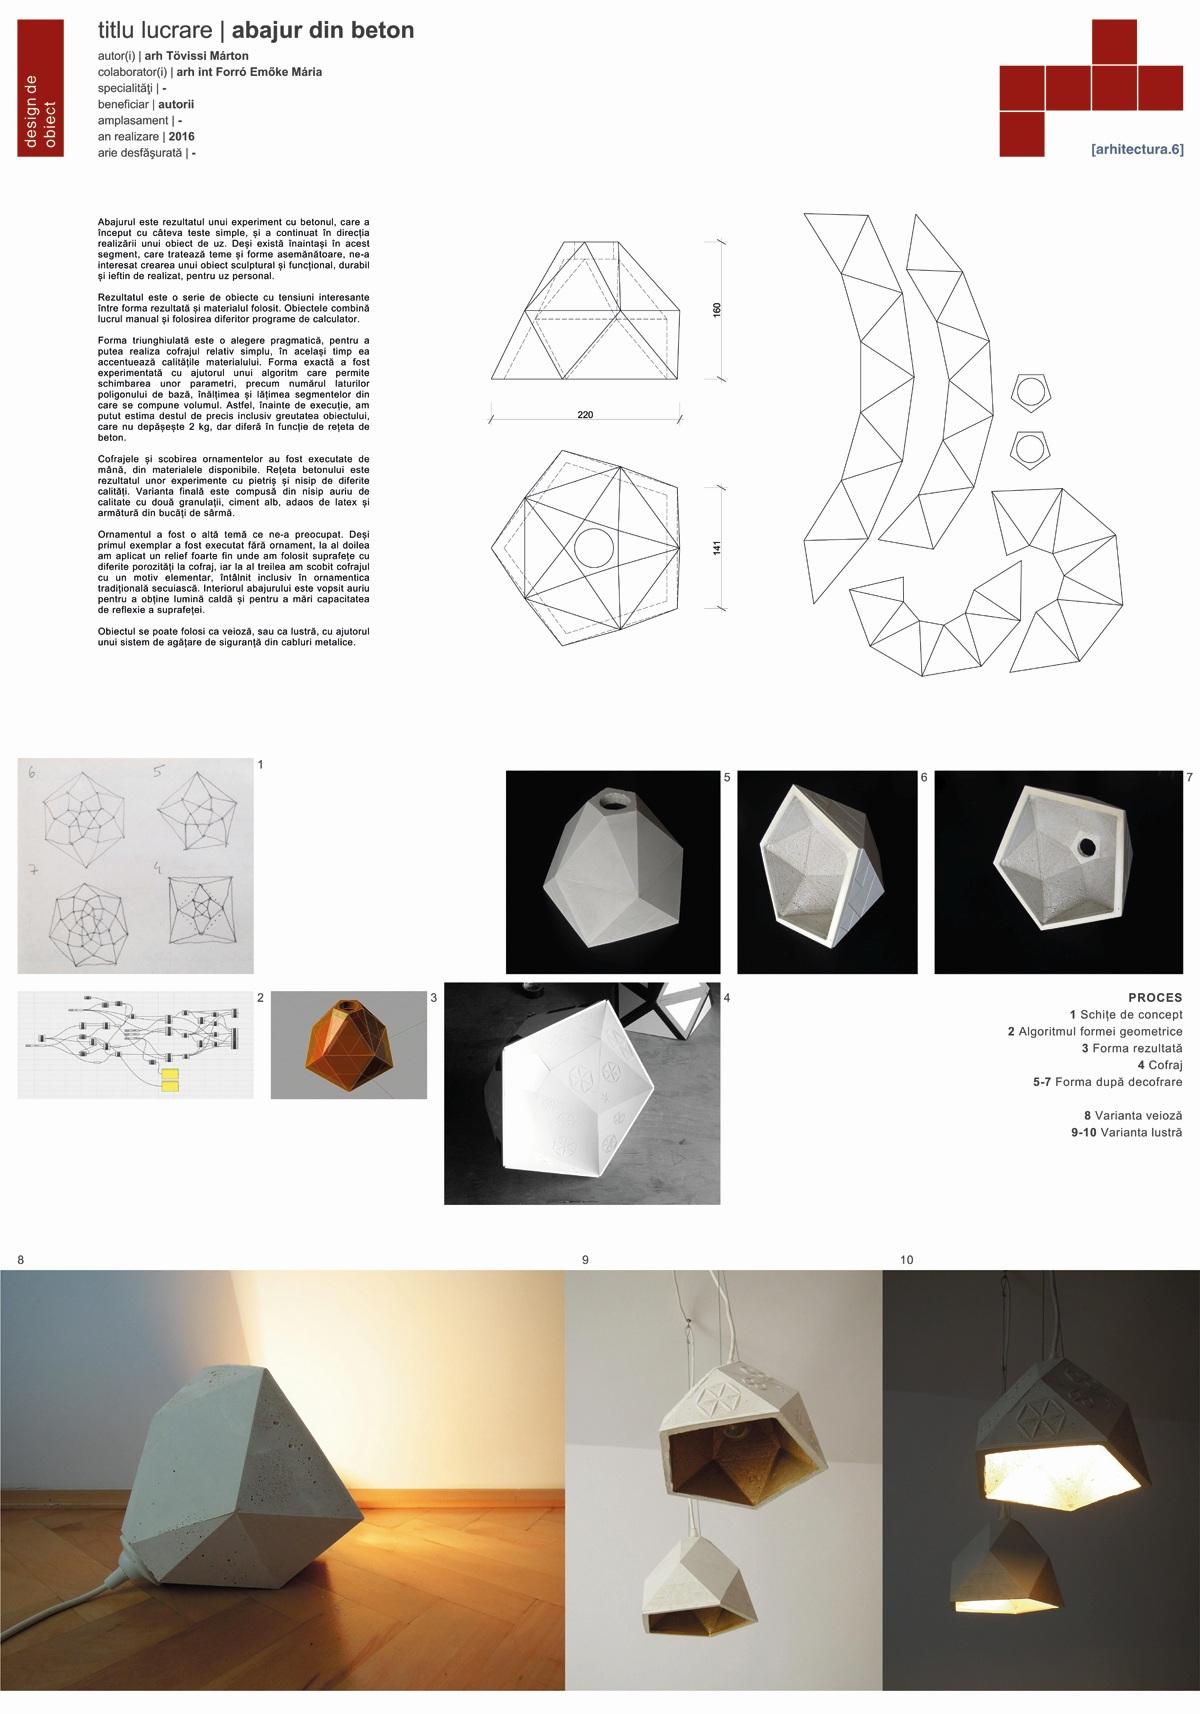 42_A6 2016_design de obiect_Tovissi M_web